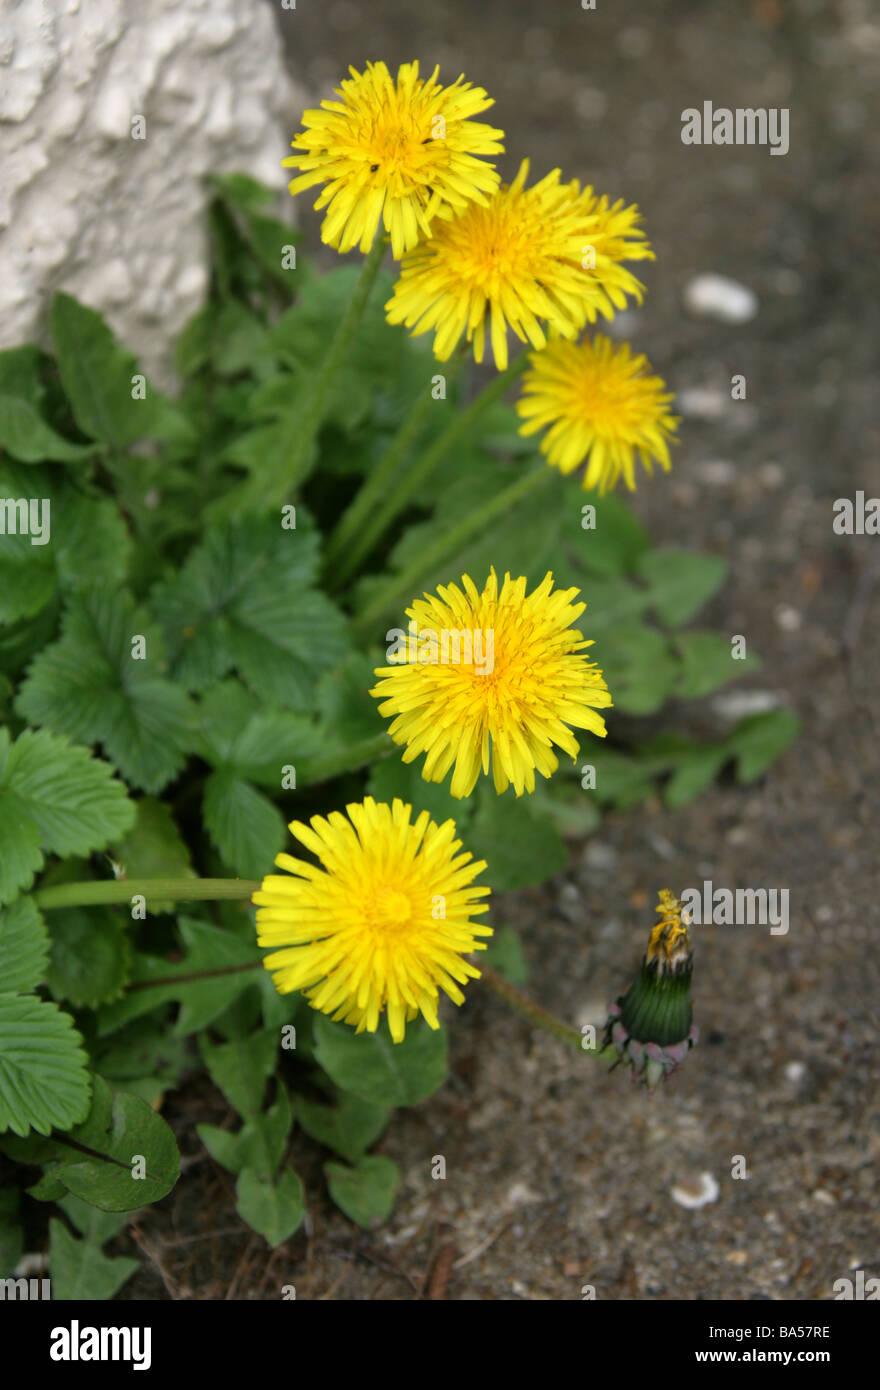 Dandelion, Taraxacum officinale,  Asteraceae - Stock Image